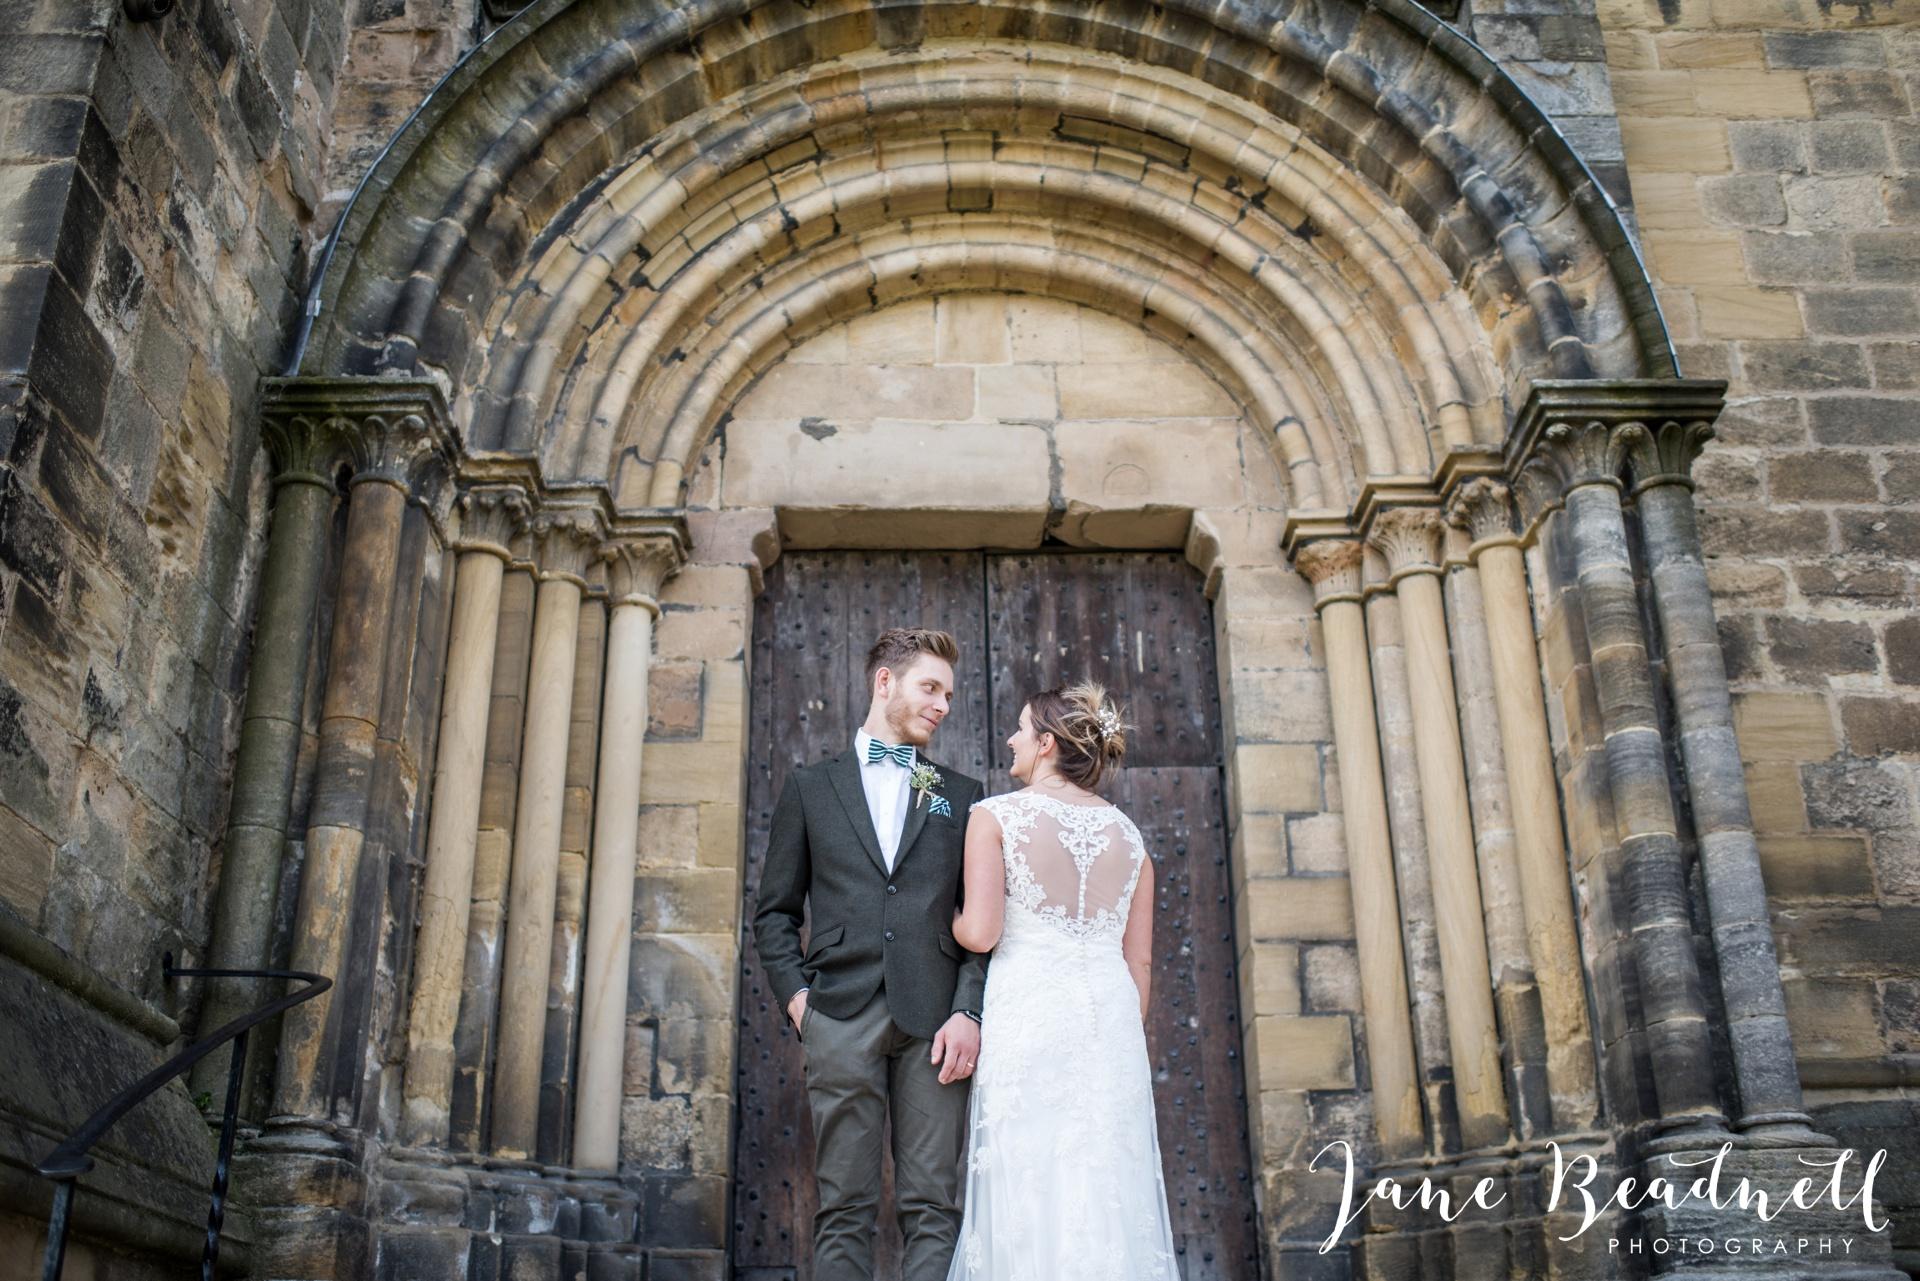 Jane Beadnell fine art wedding photographer The Old Deanery Ripon_0085